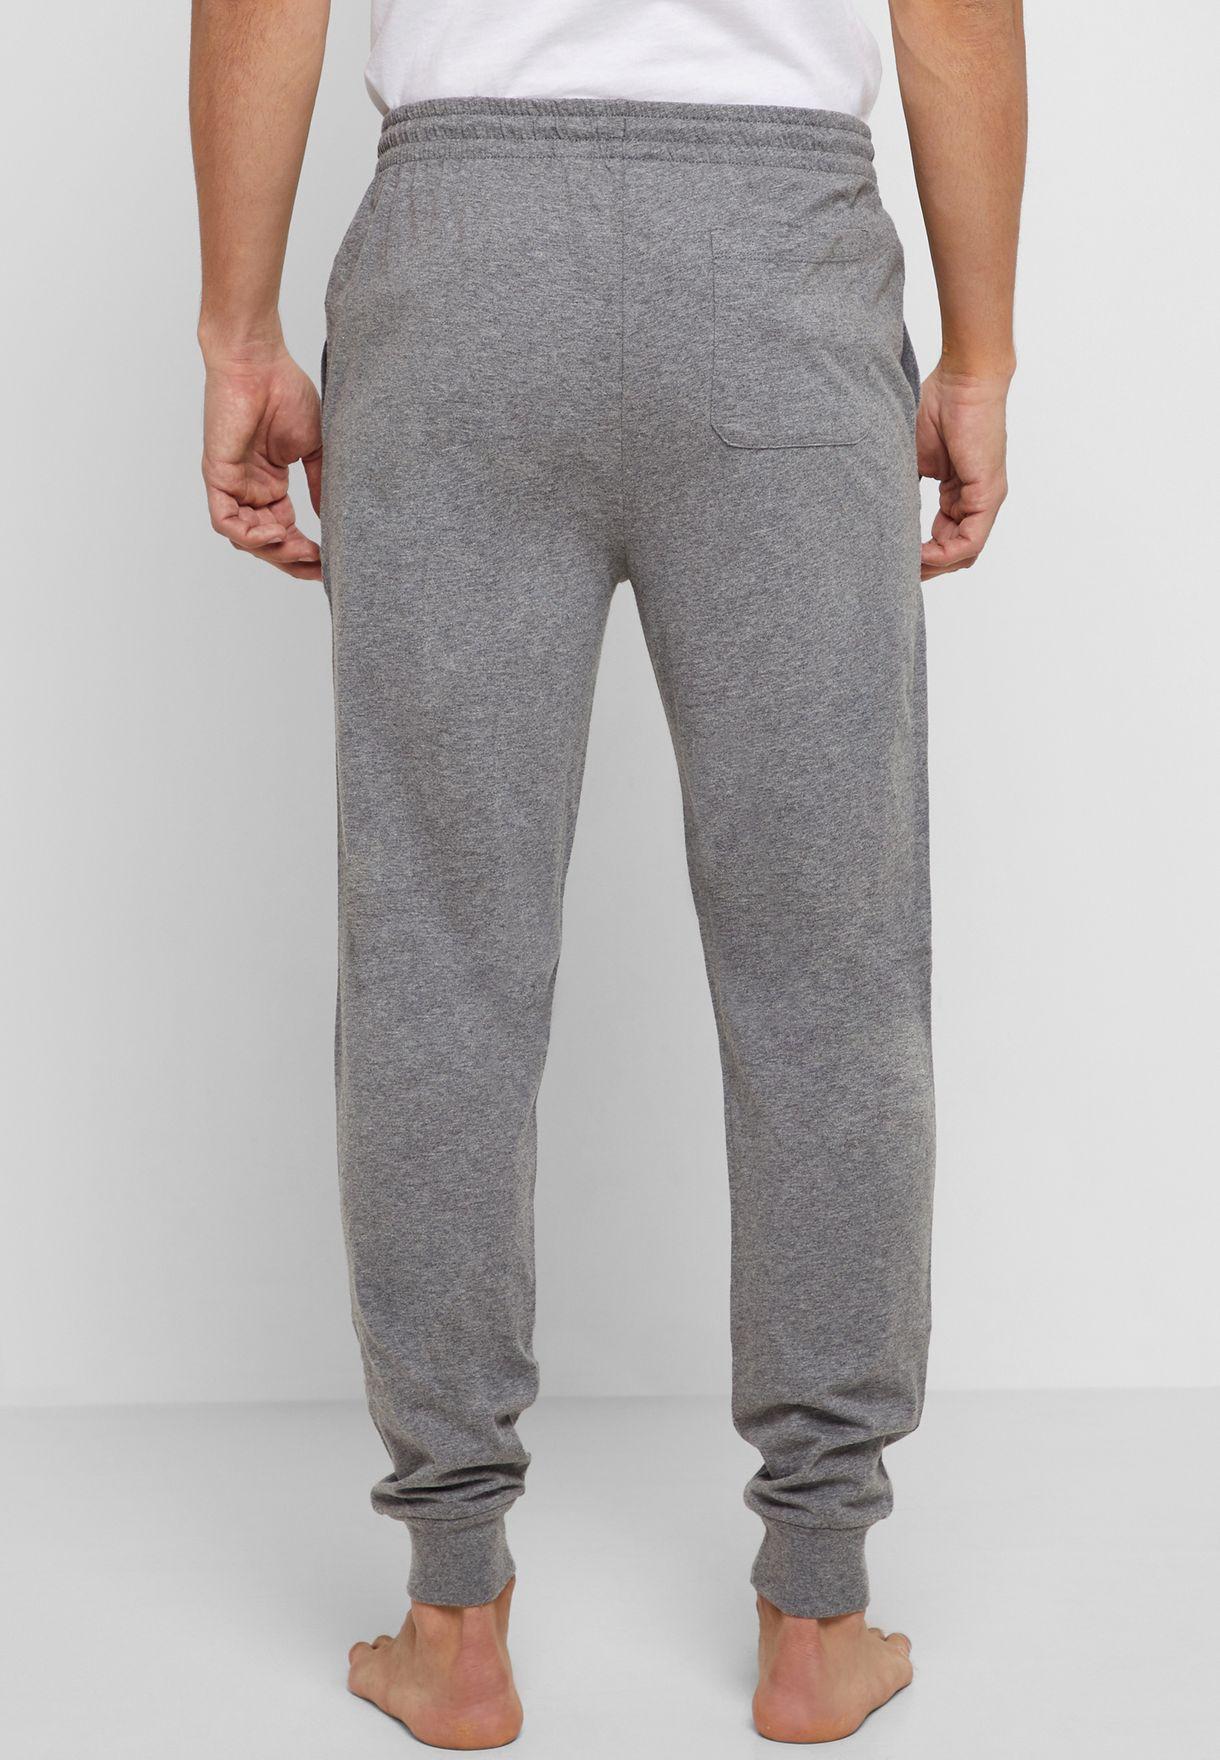 Jama Cuffed Sweatpants